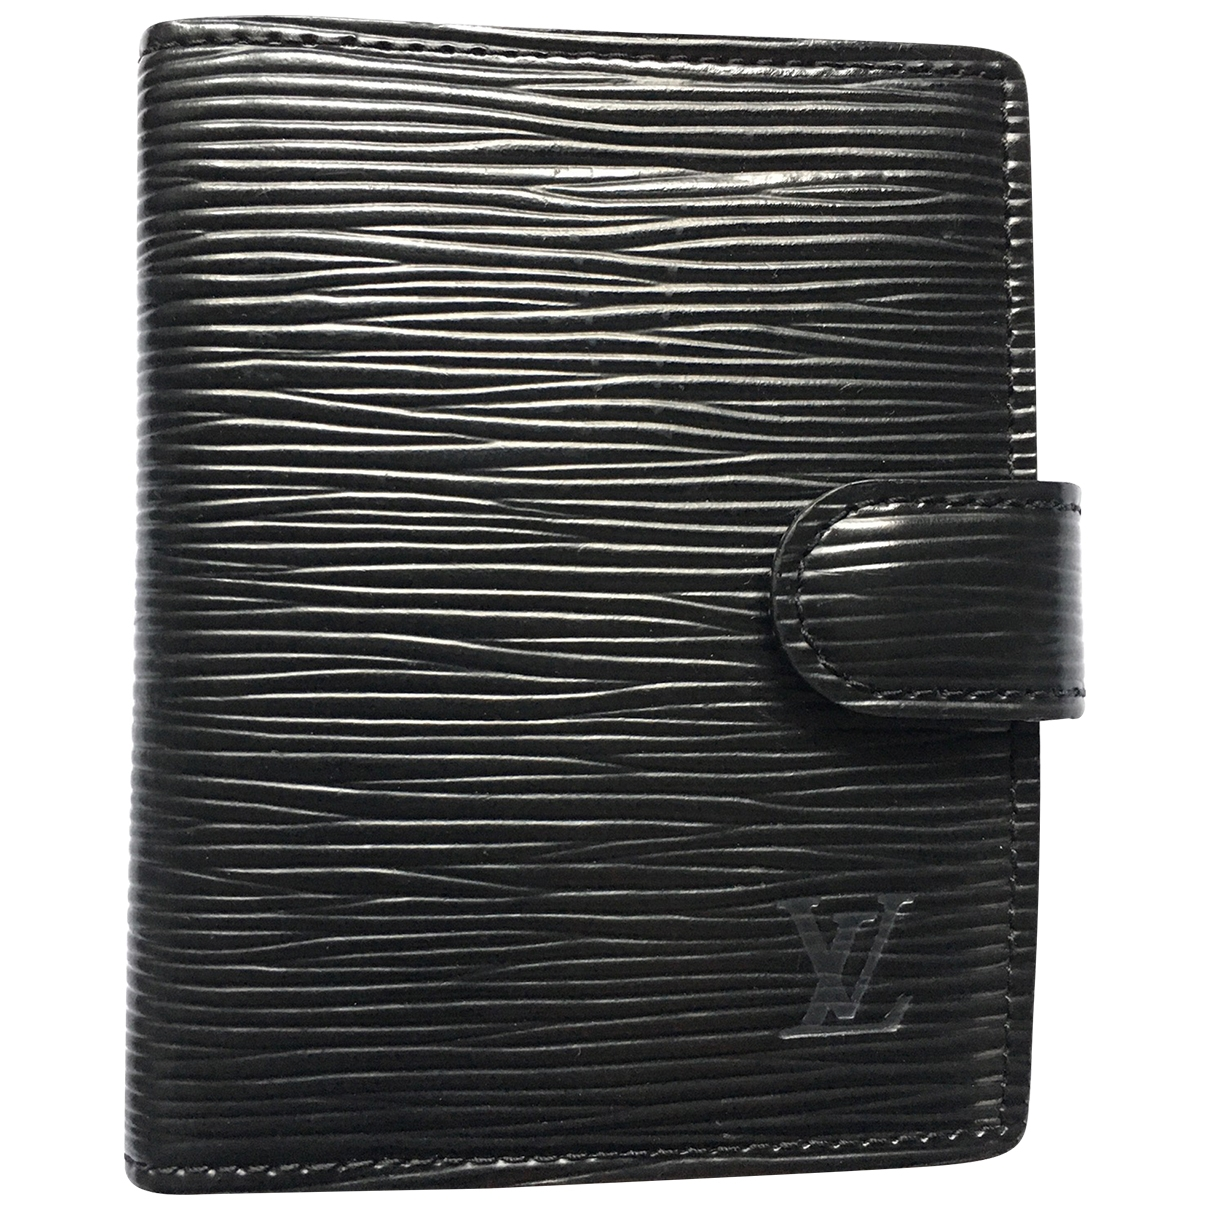 Louis Vuitton Couverture dagenda PM Accessoires und Dekoration in  Schwarz Leder